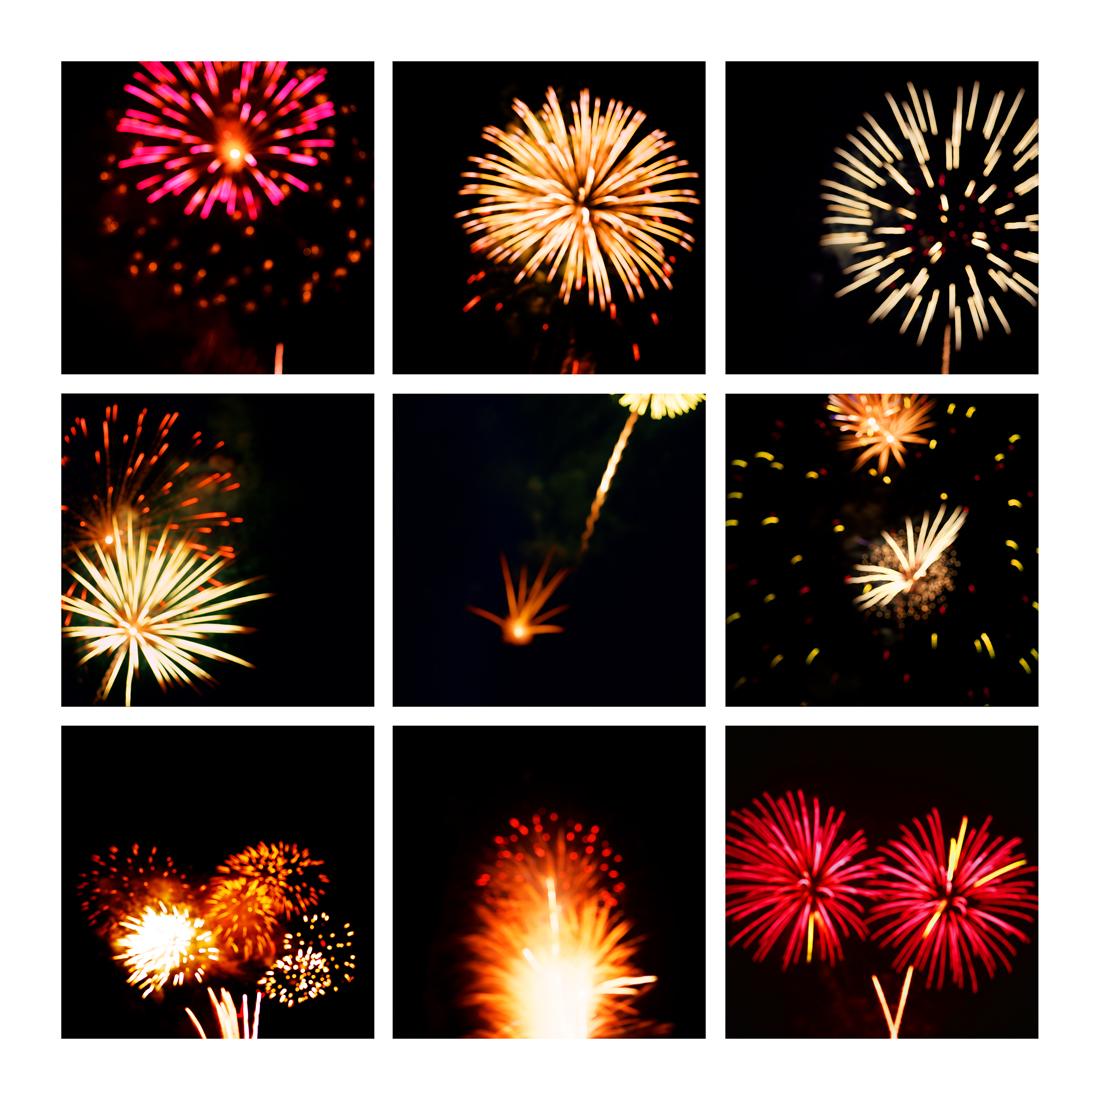 Fireworks #6, 2019 (2008-2019)